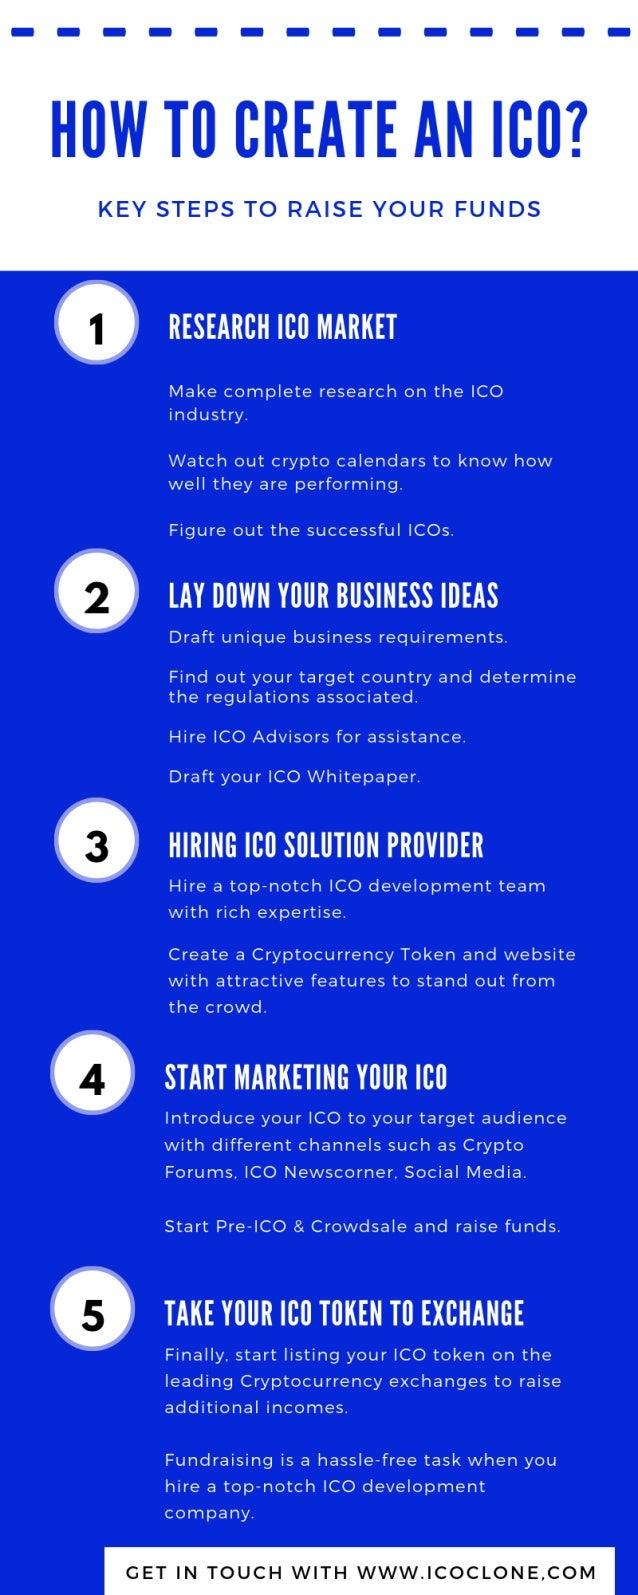 How To Create An ICO?